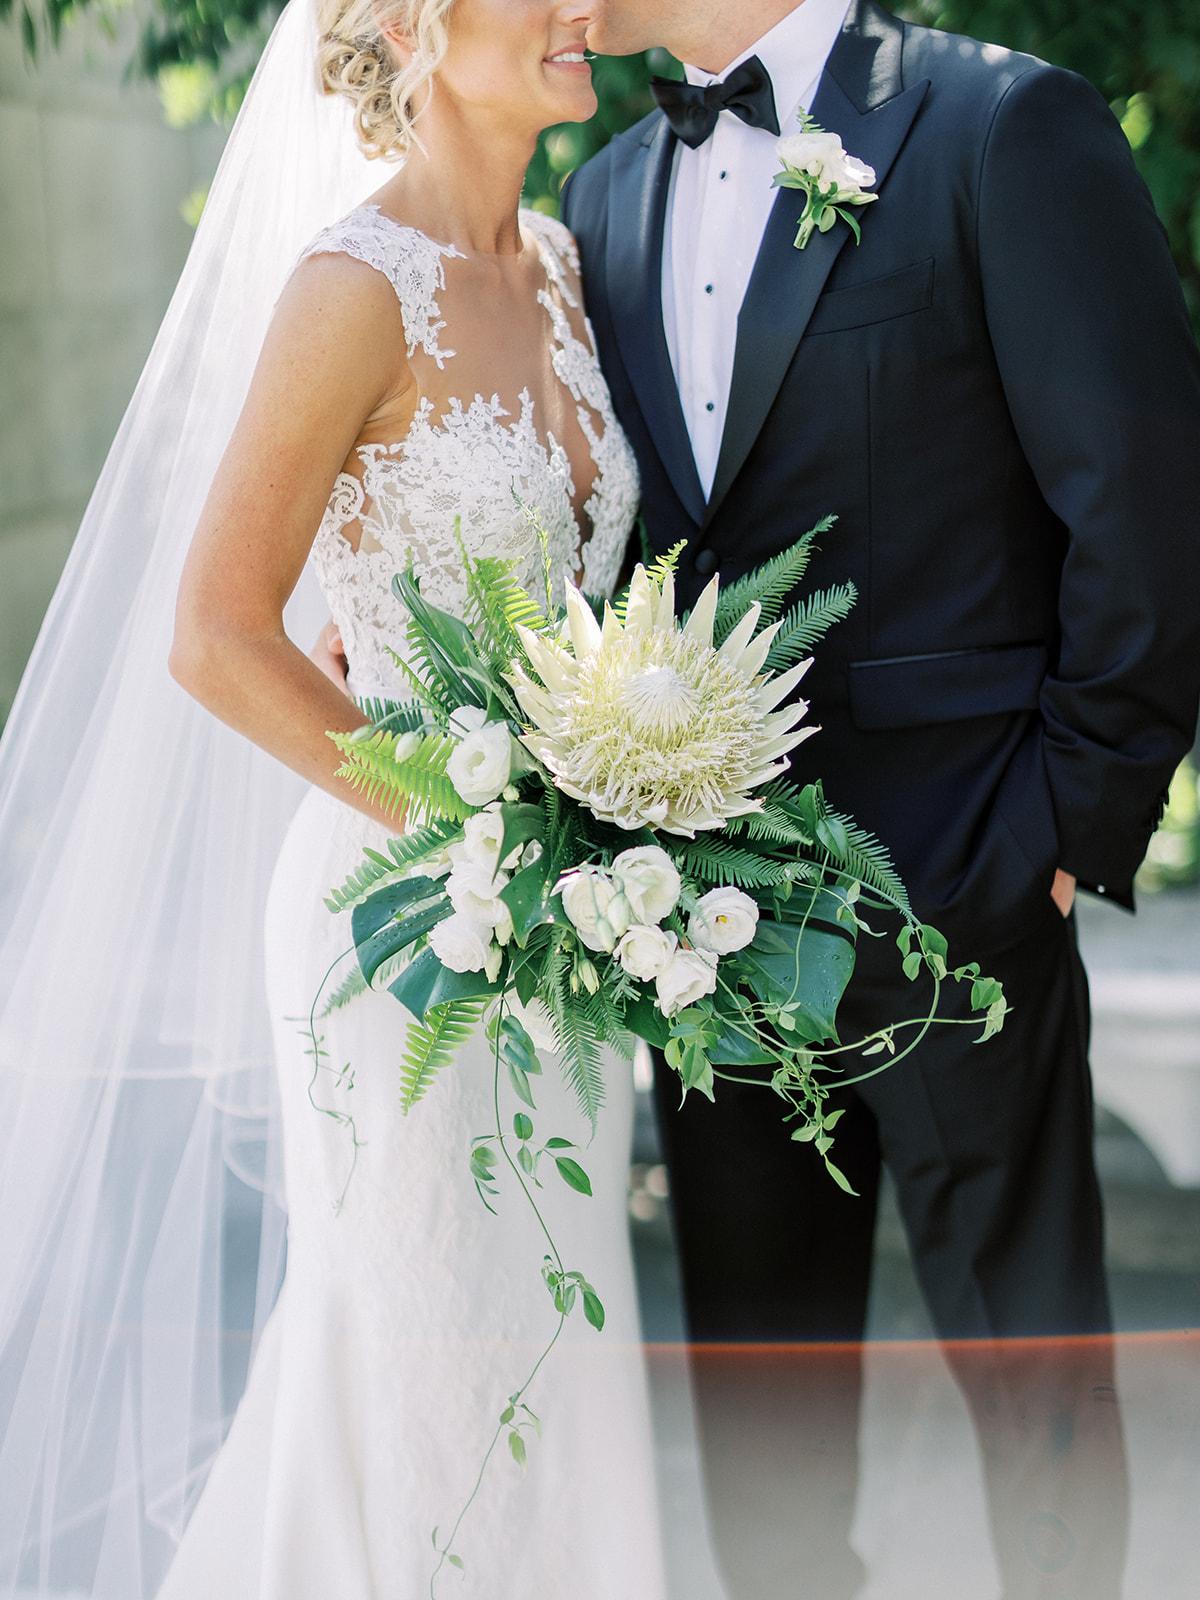 bride and groom portrait bride holding giant single white protea flower bouquet